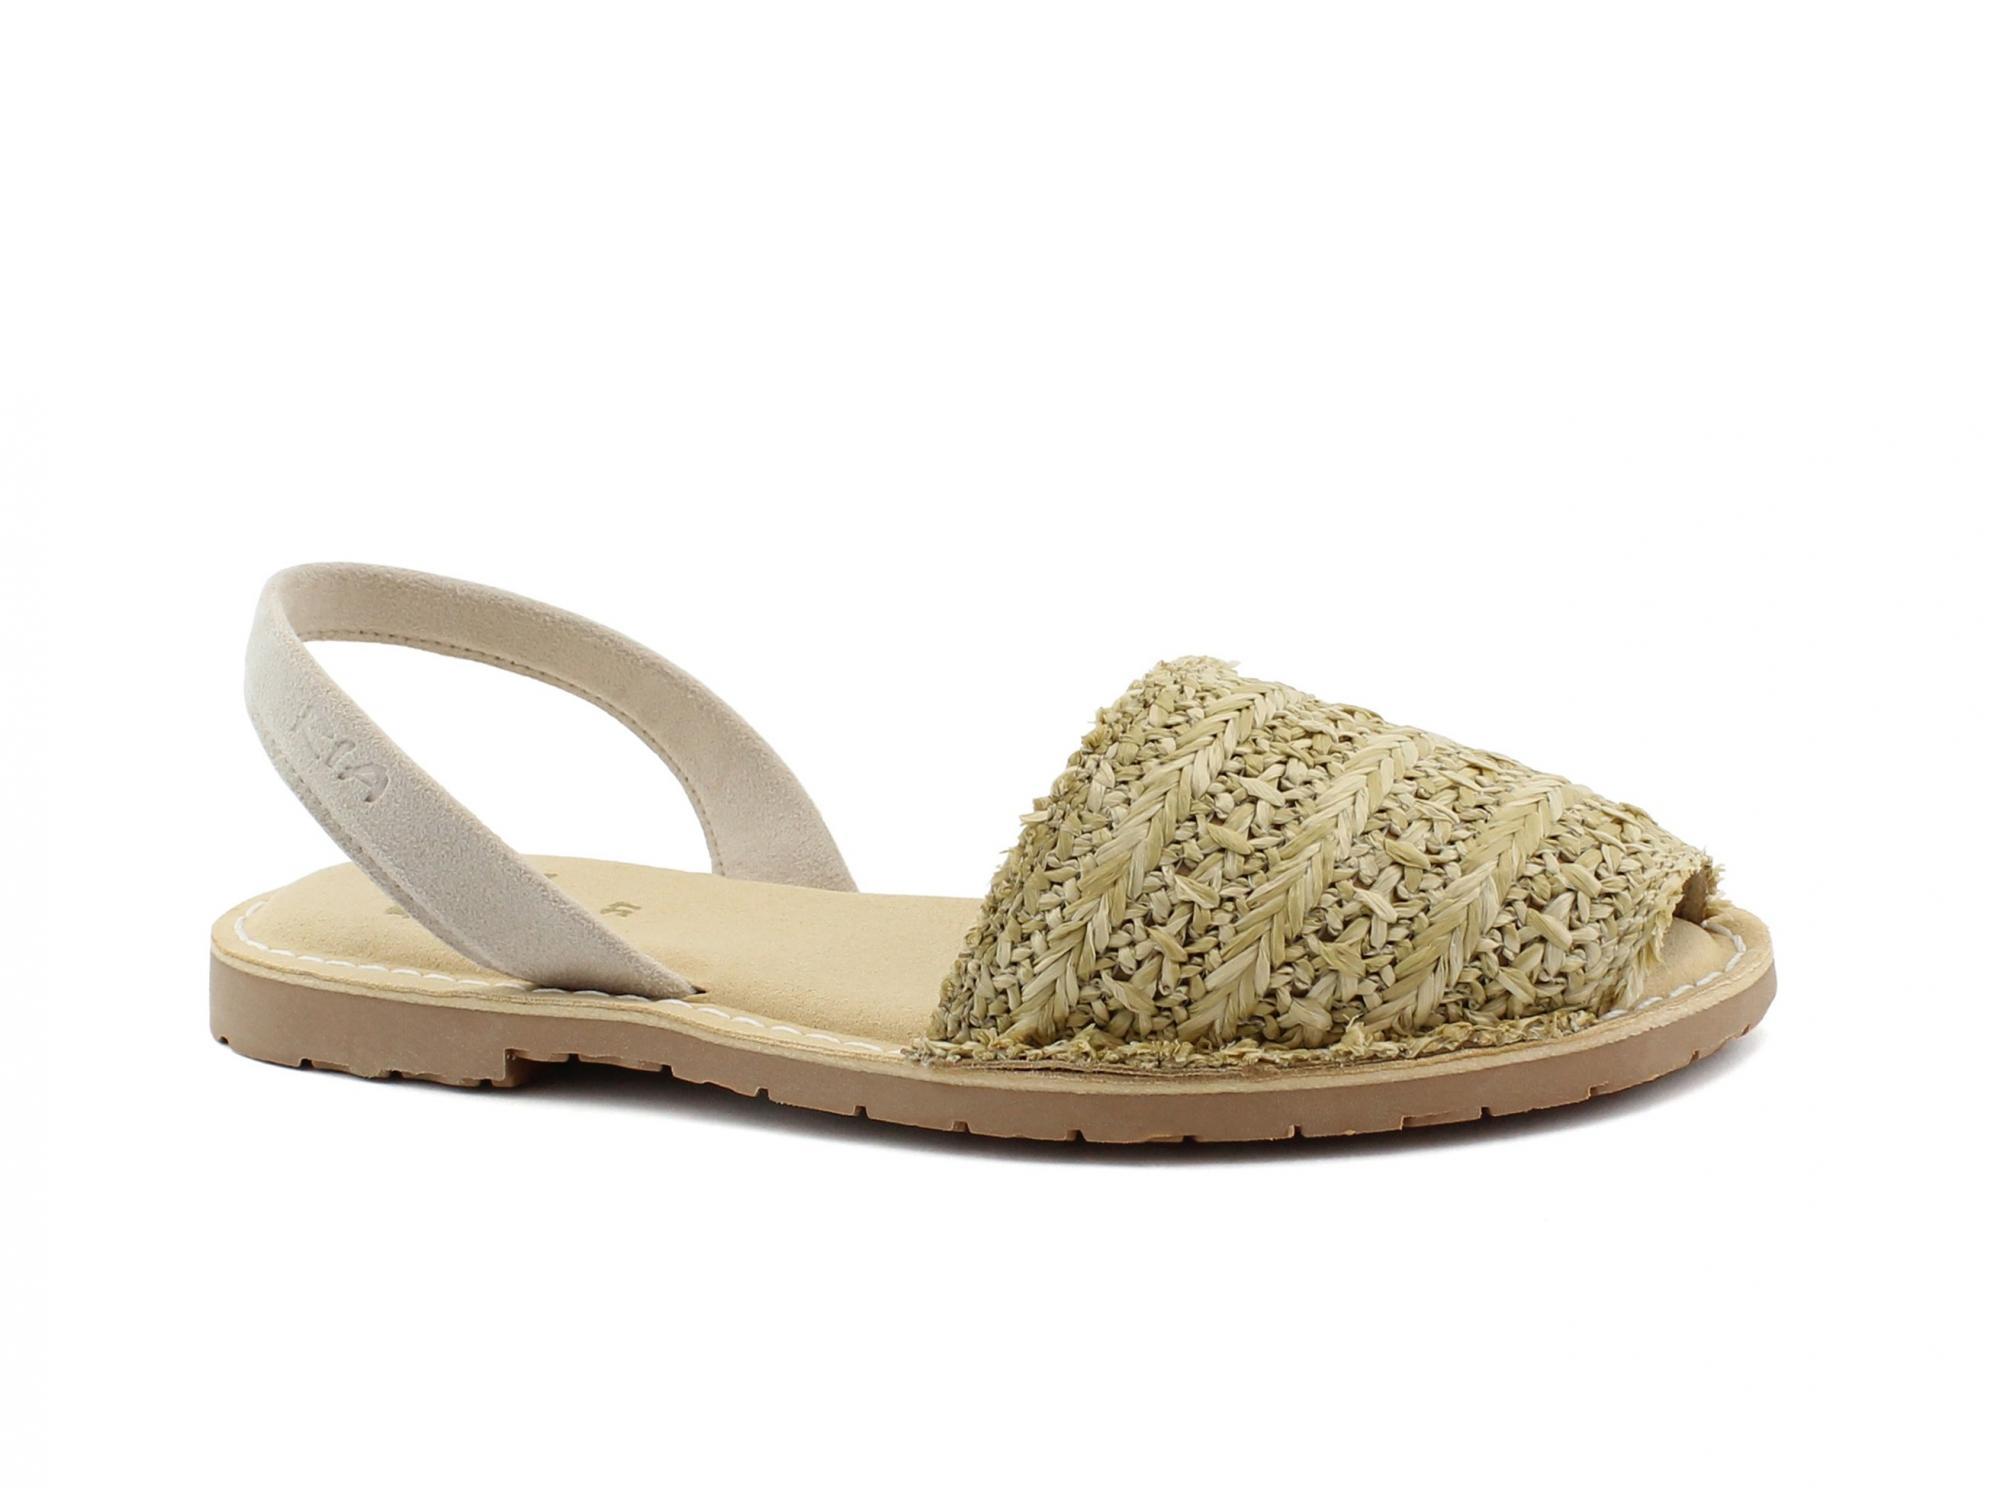 4255d02a Zapatos RIA para mujer. Sandalias menorquinas. Plantilla vegana. Zapatos  veganos. - VeganShoes.it